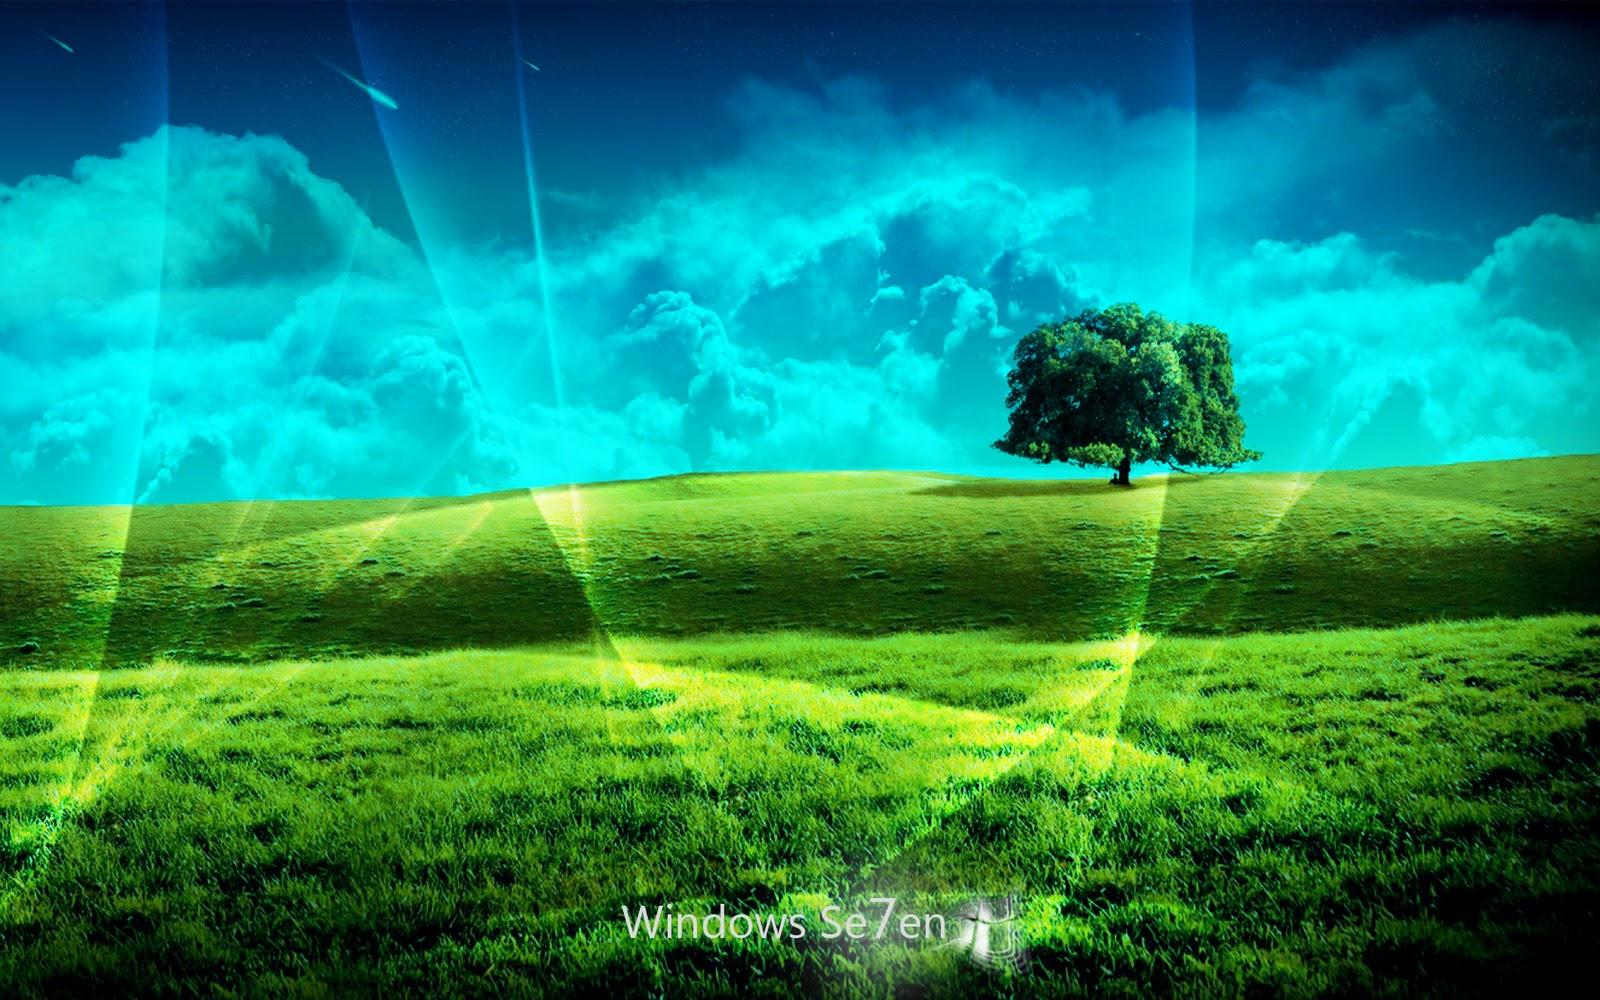 Animated Desktop Wallpaper For Windows 7